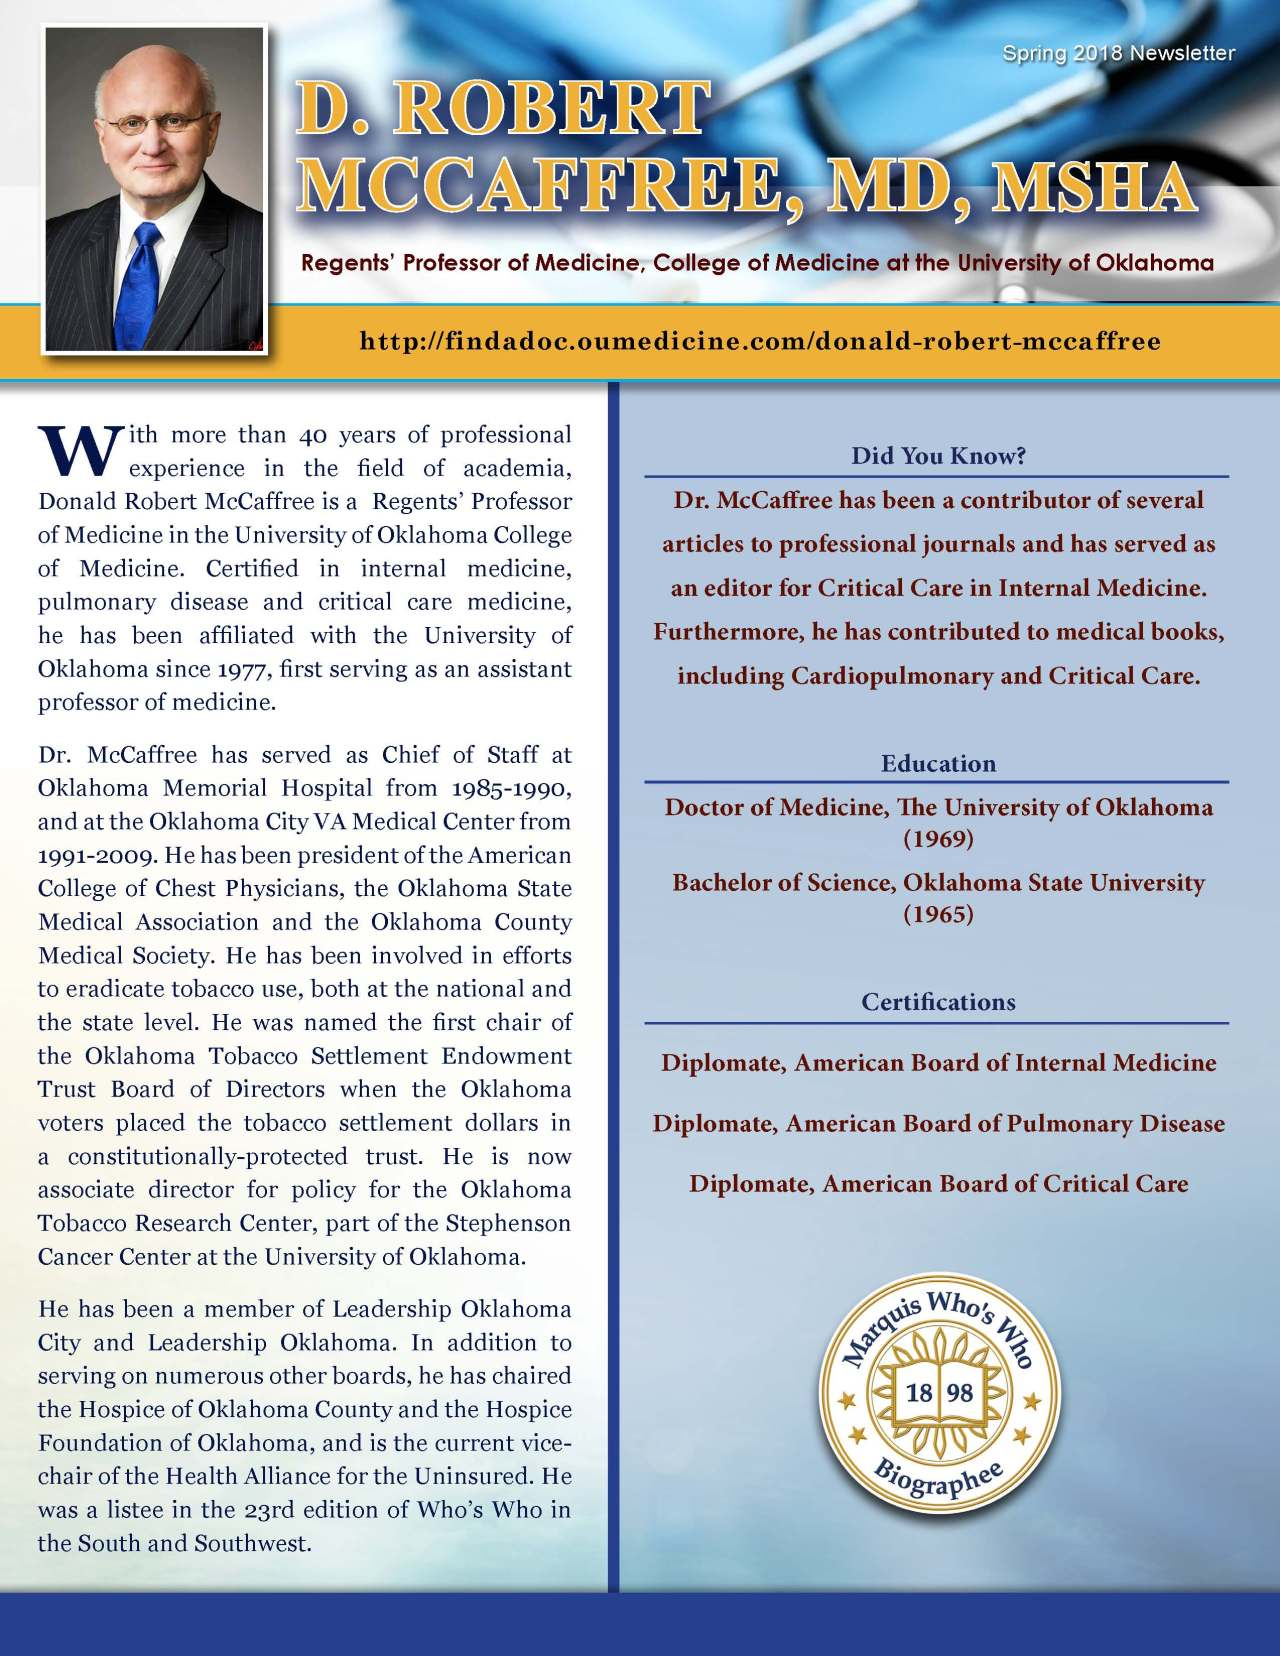 McCaffree, Donald 3703520_21853255 Newsletter REVISED